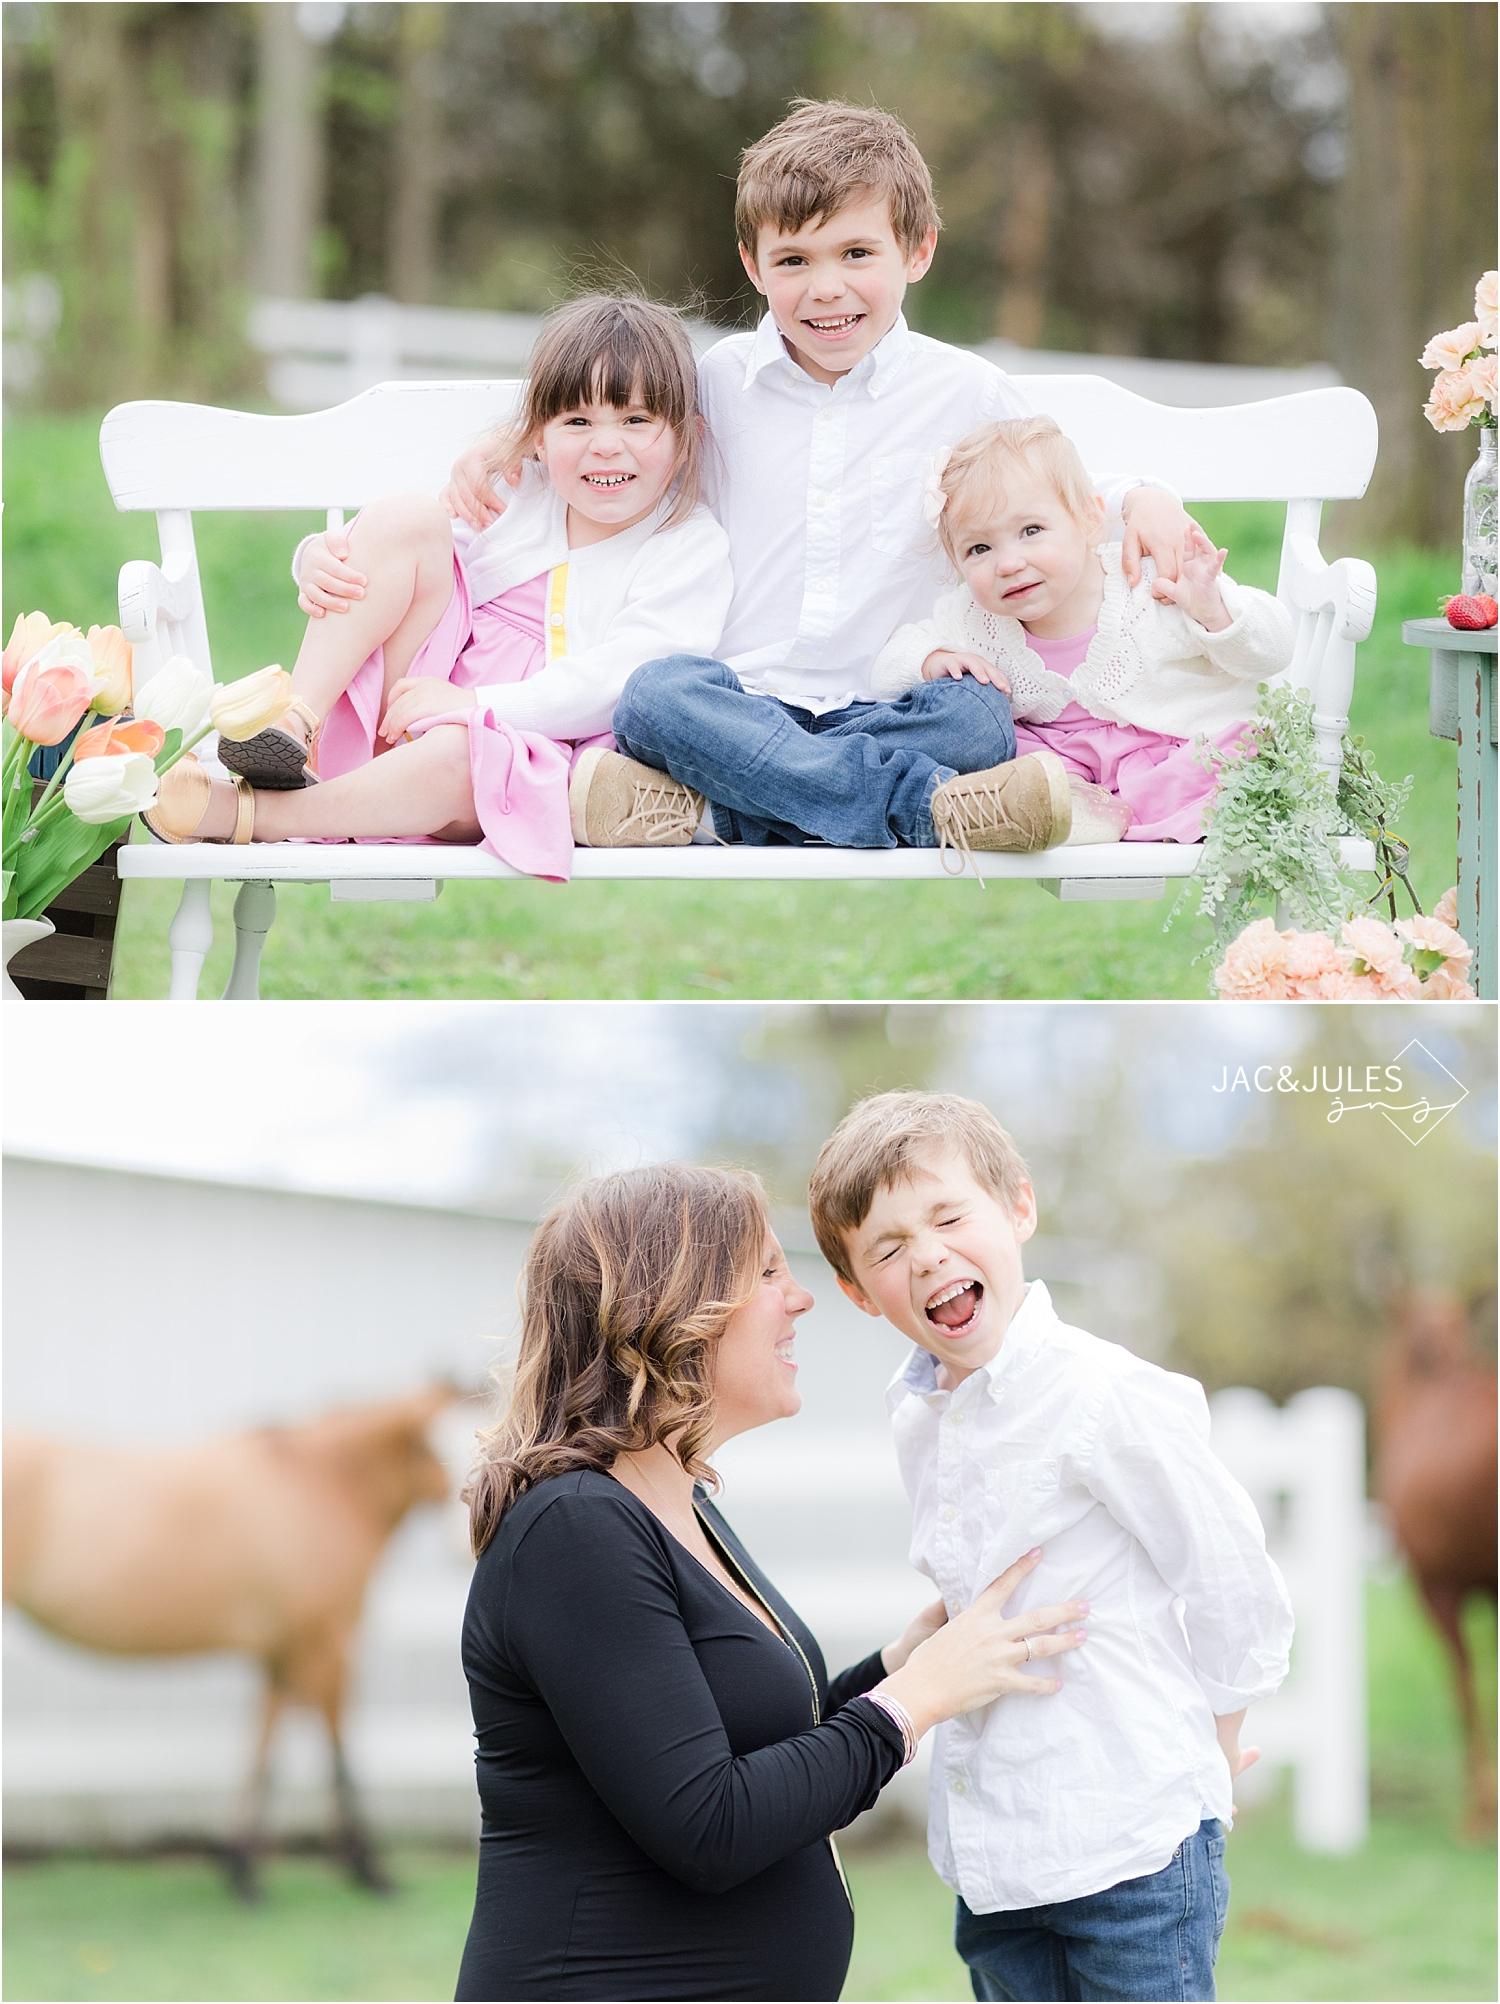 spring family photos at a farm in nj